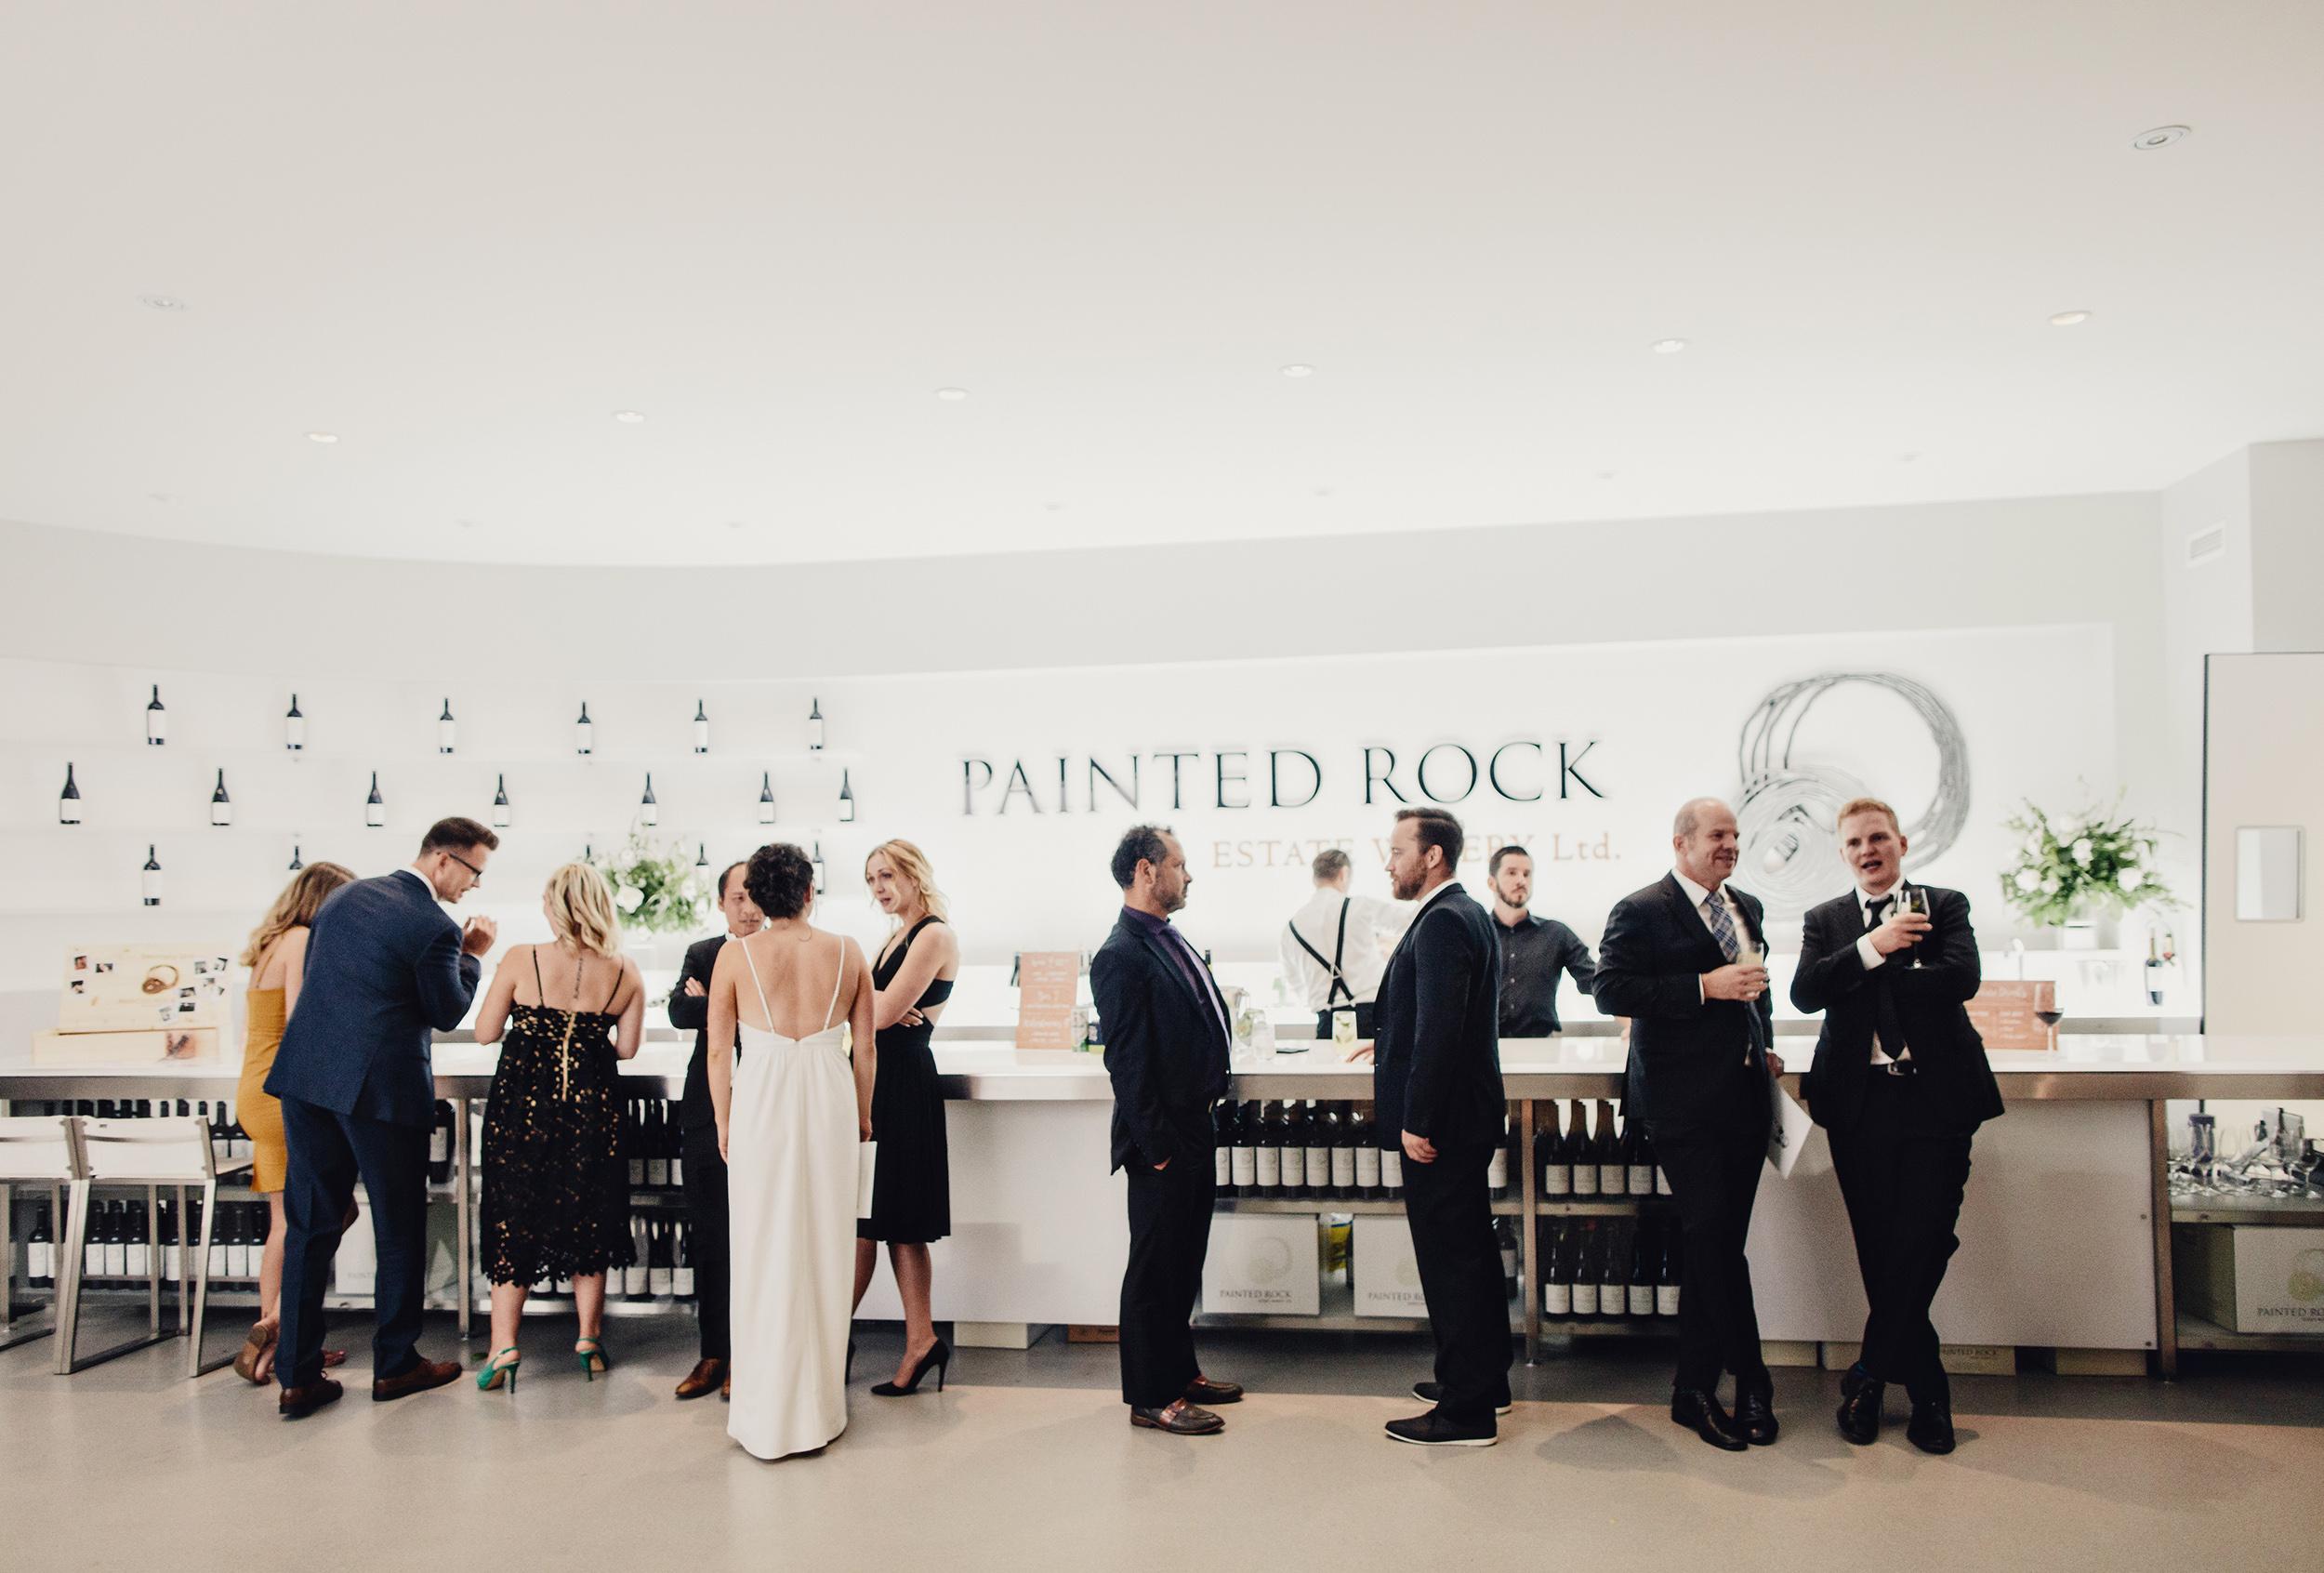 painted-rock-Wedding-photos0052.JPG